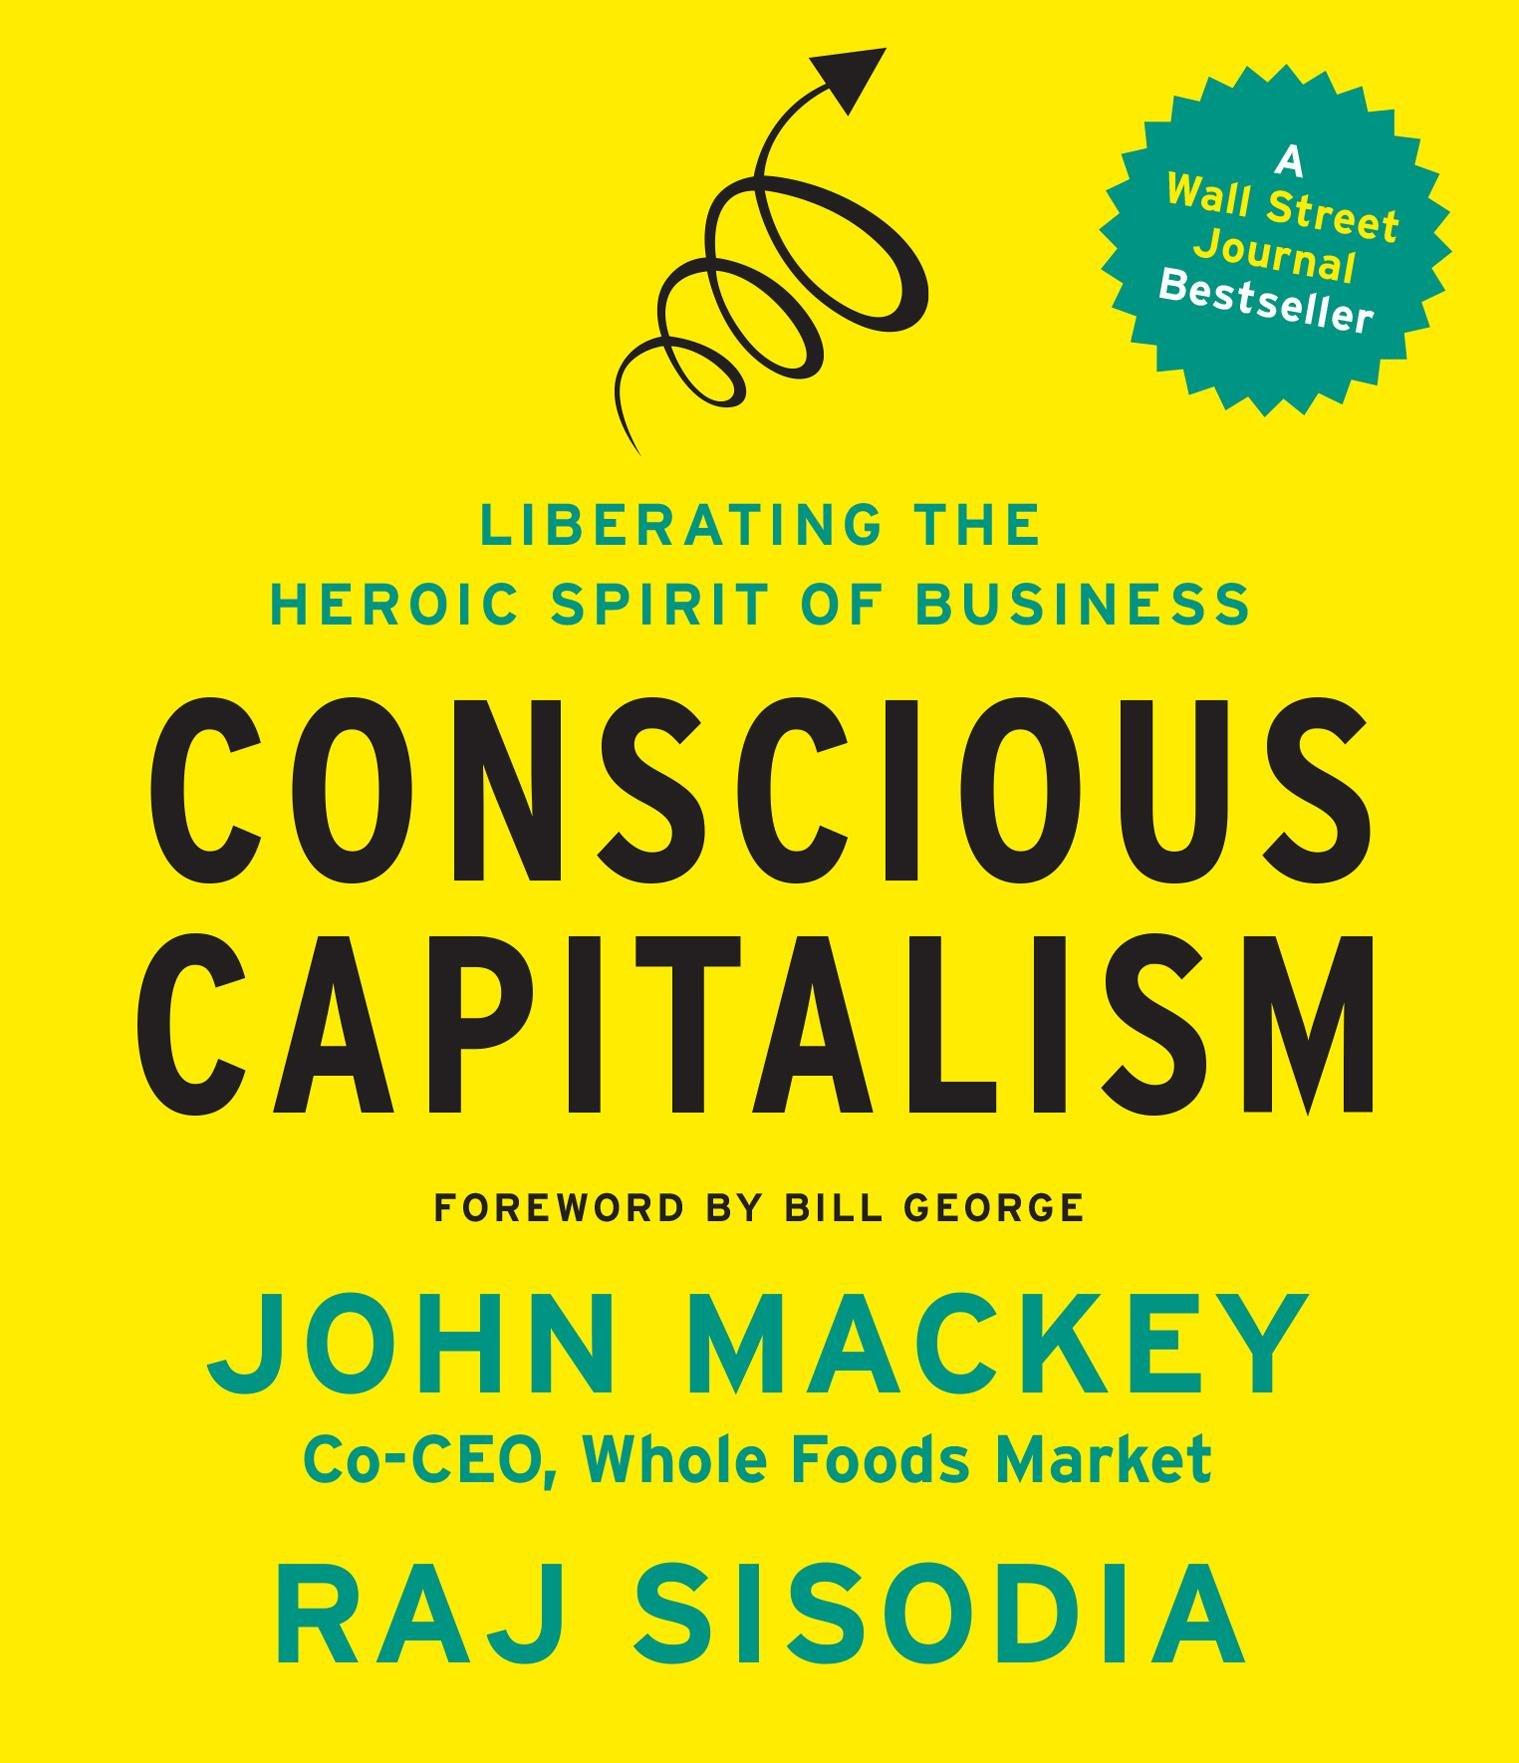 Conscious Capitalism: Liberating the Heroic Spirit of Business.